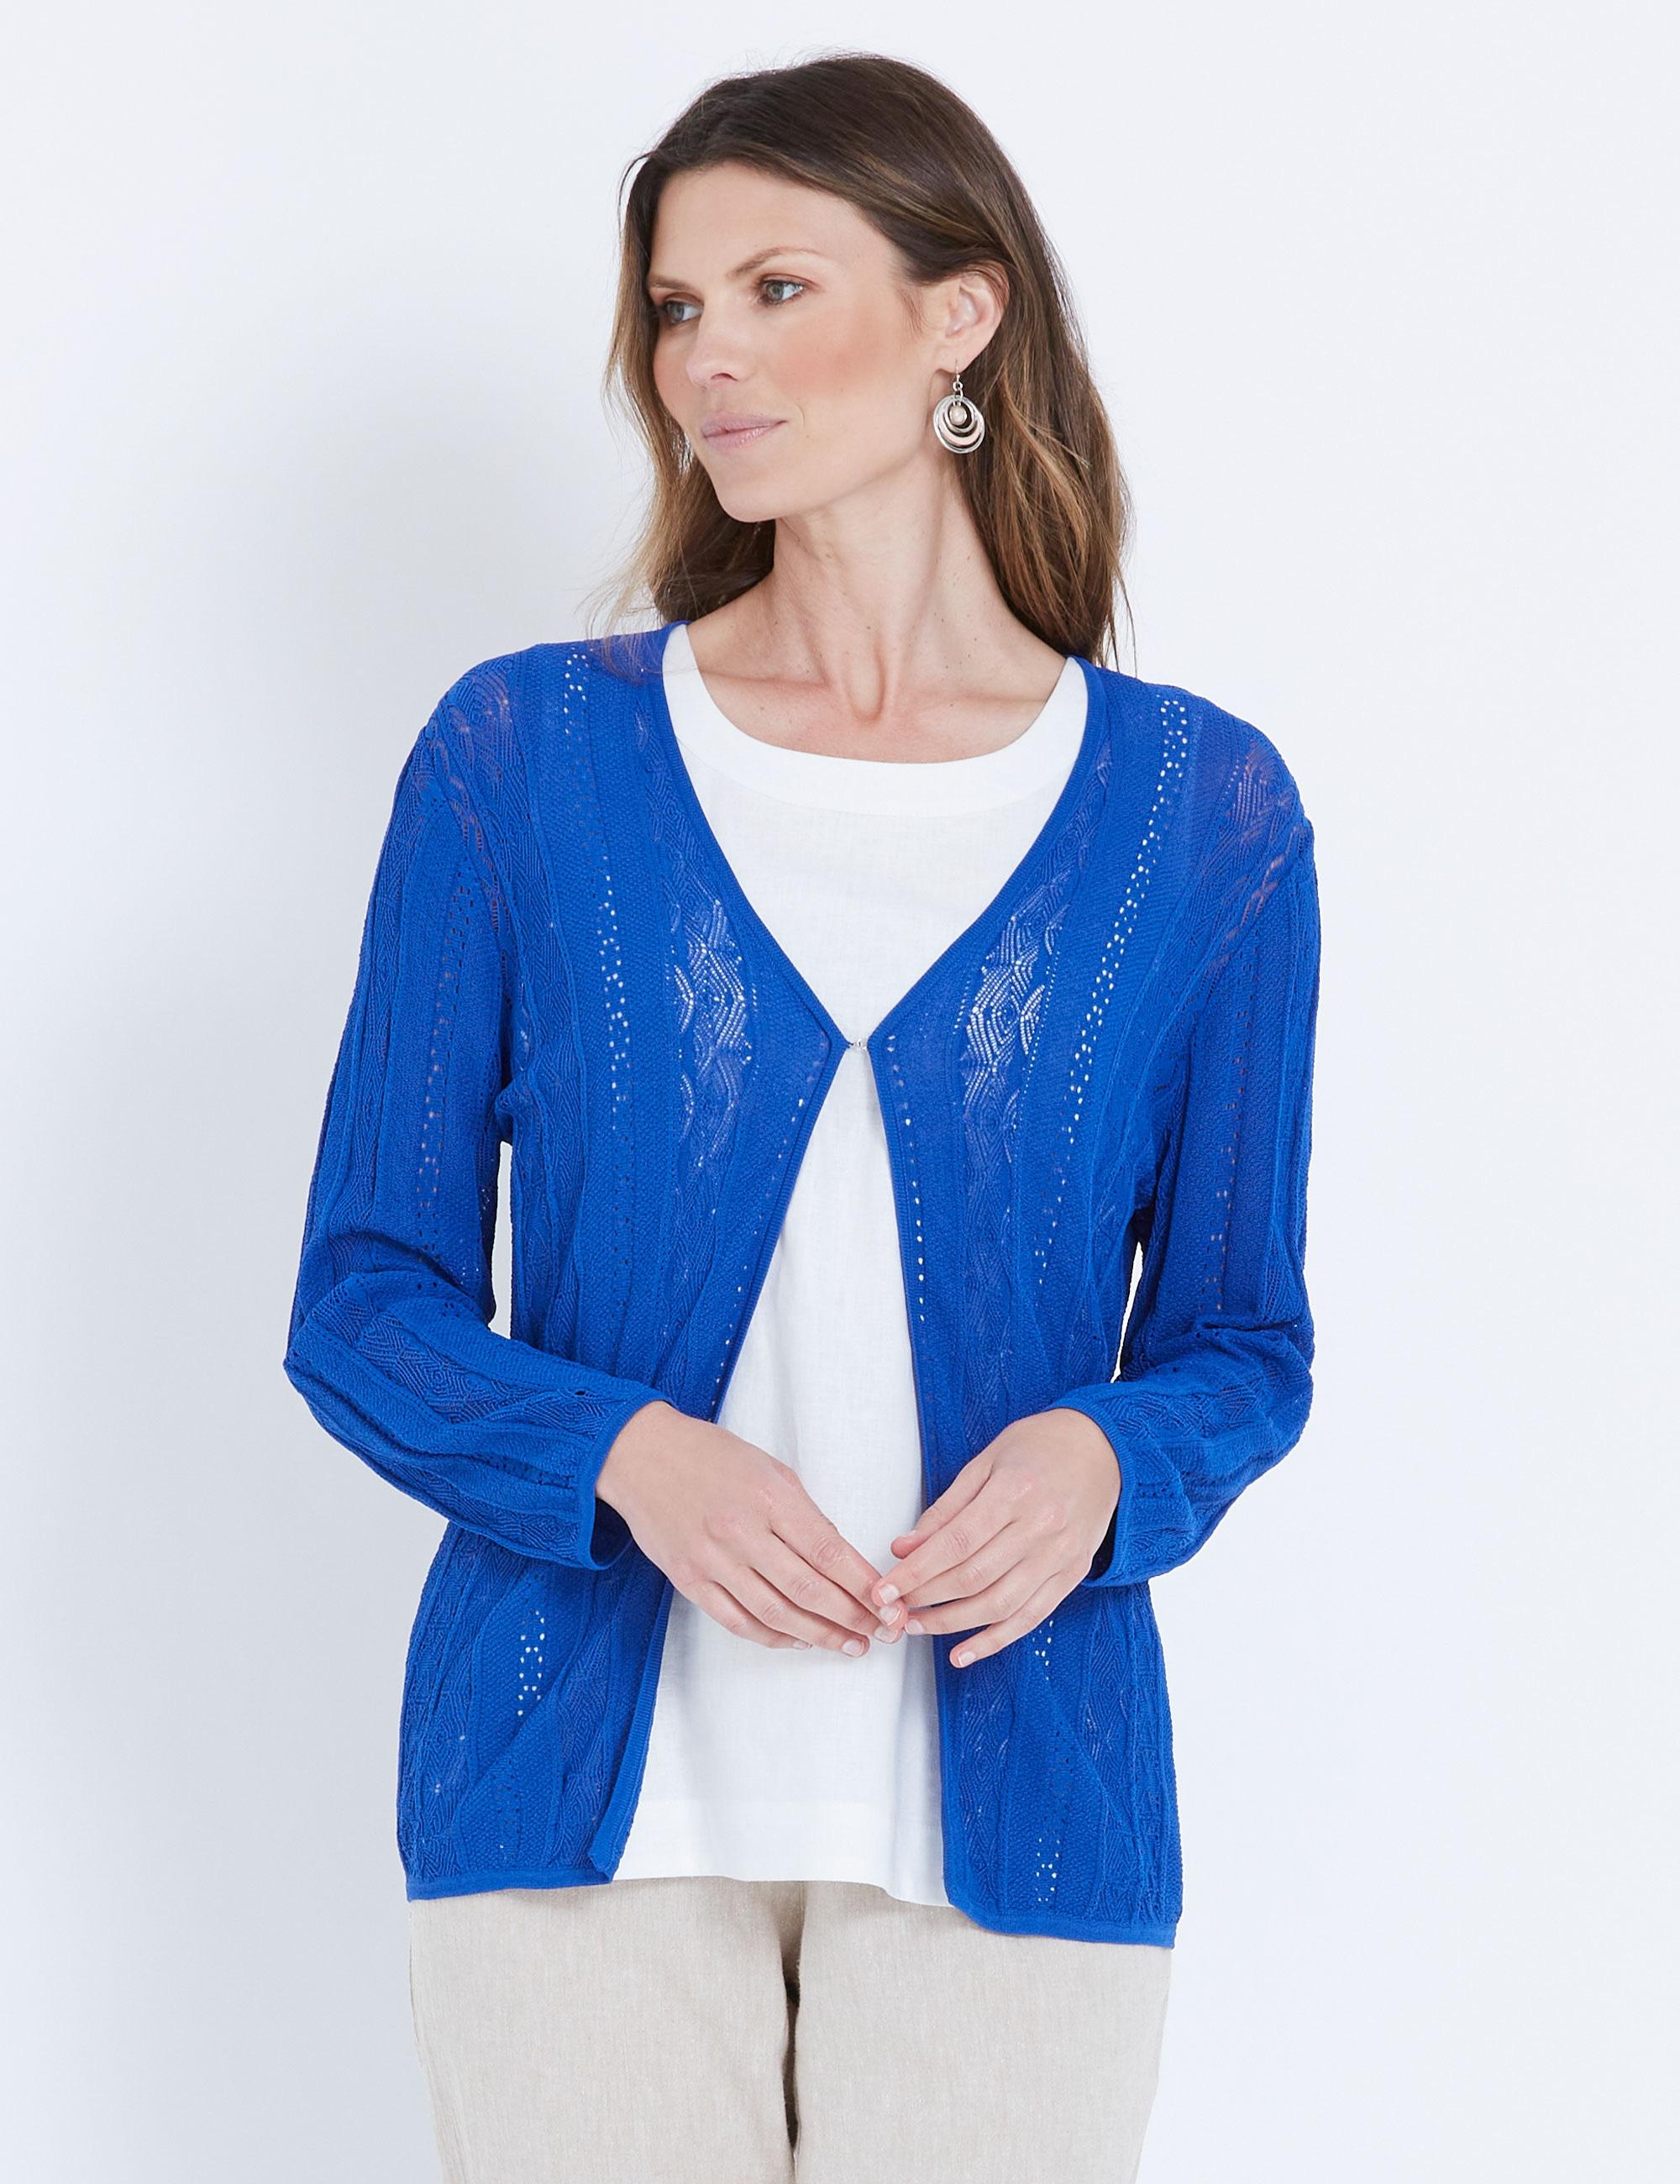 1055591420 1 - Women Fashion